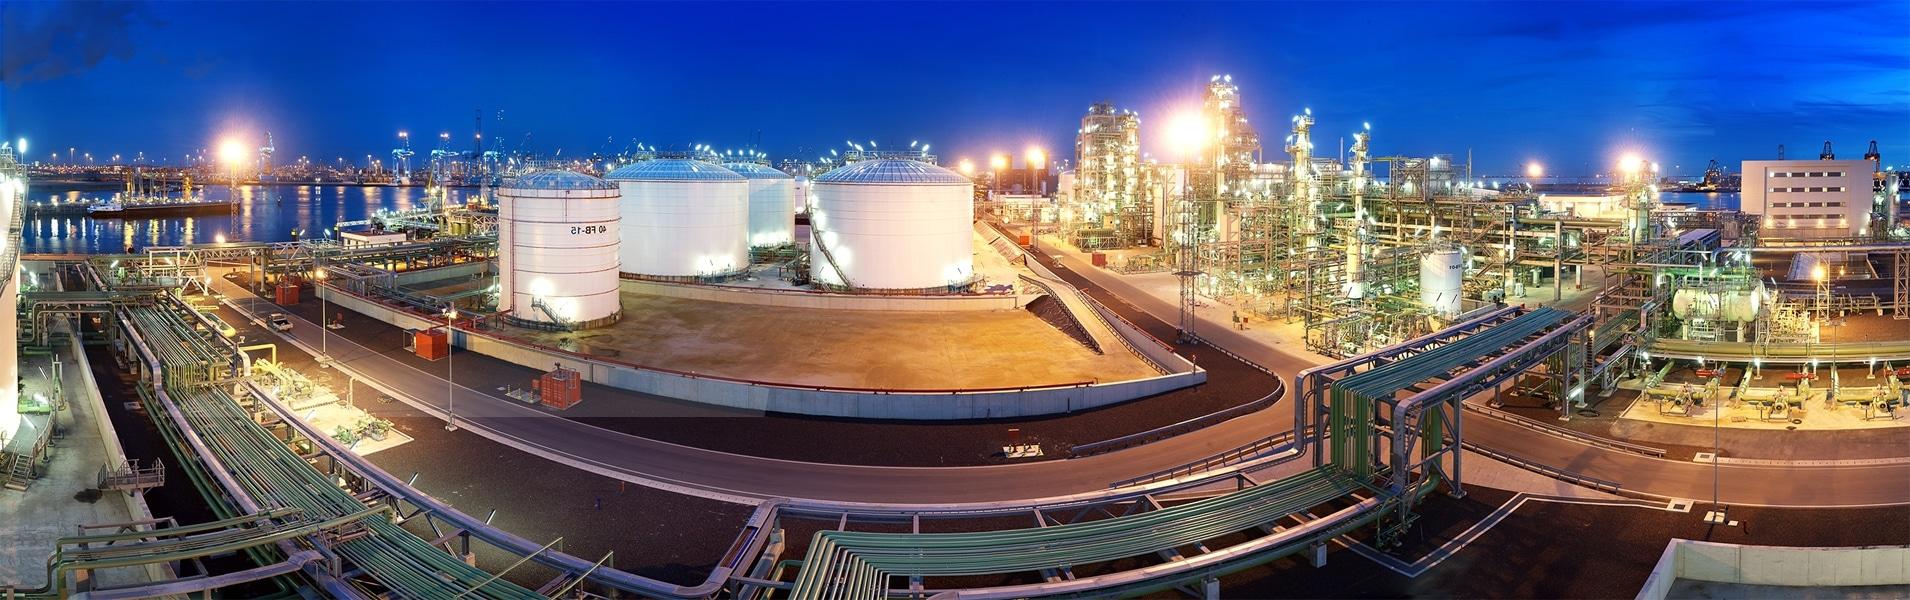 Oil refinery security patrol